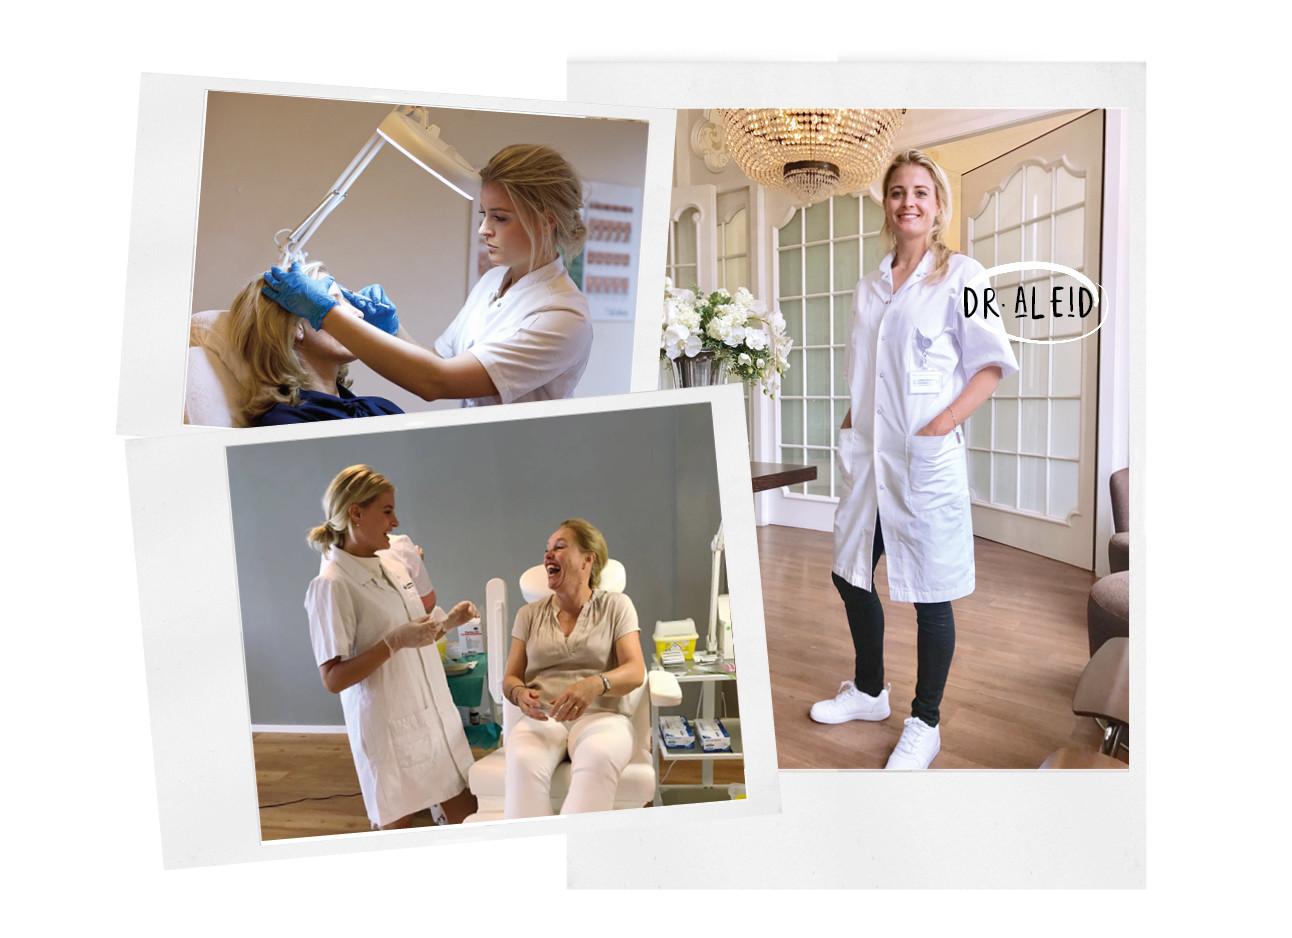 aleid koppius botox dokter interview witte jas stoel praktijk